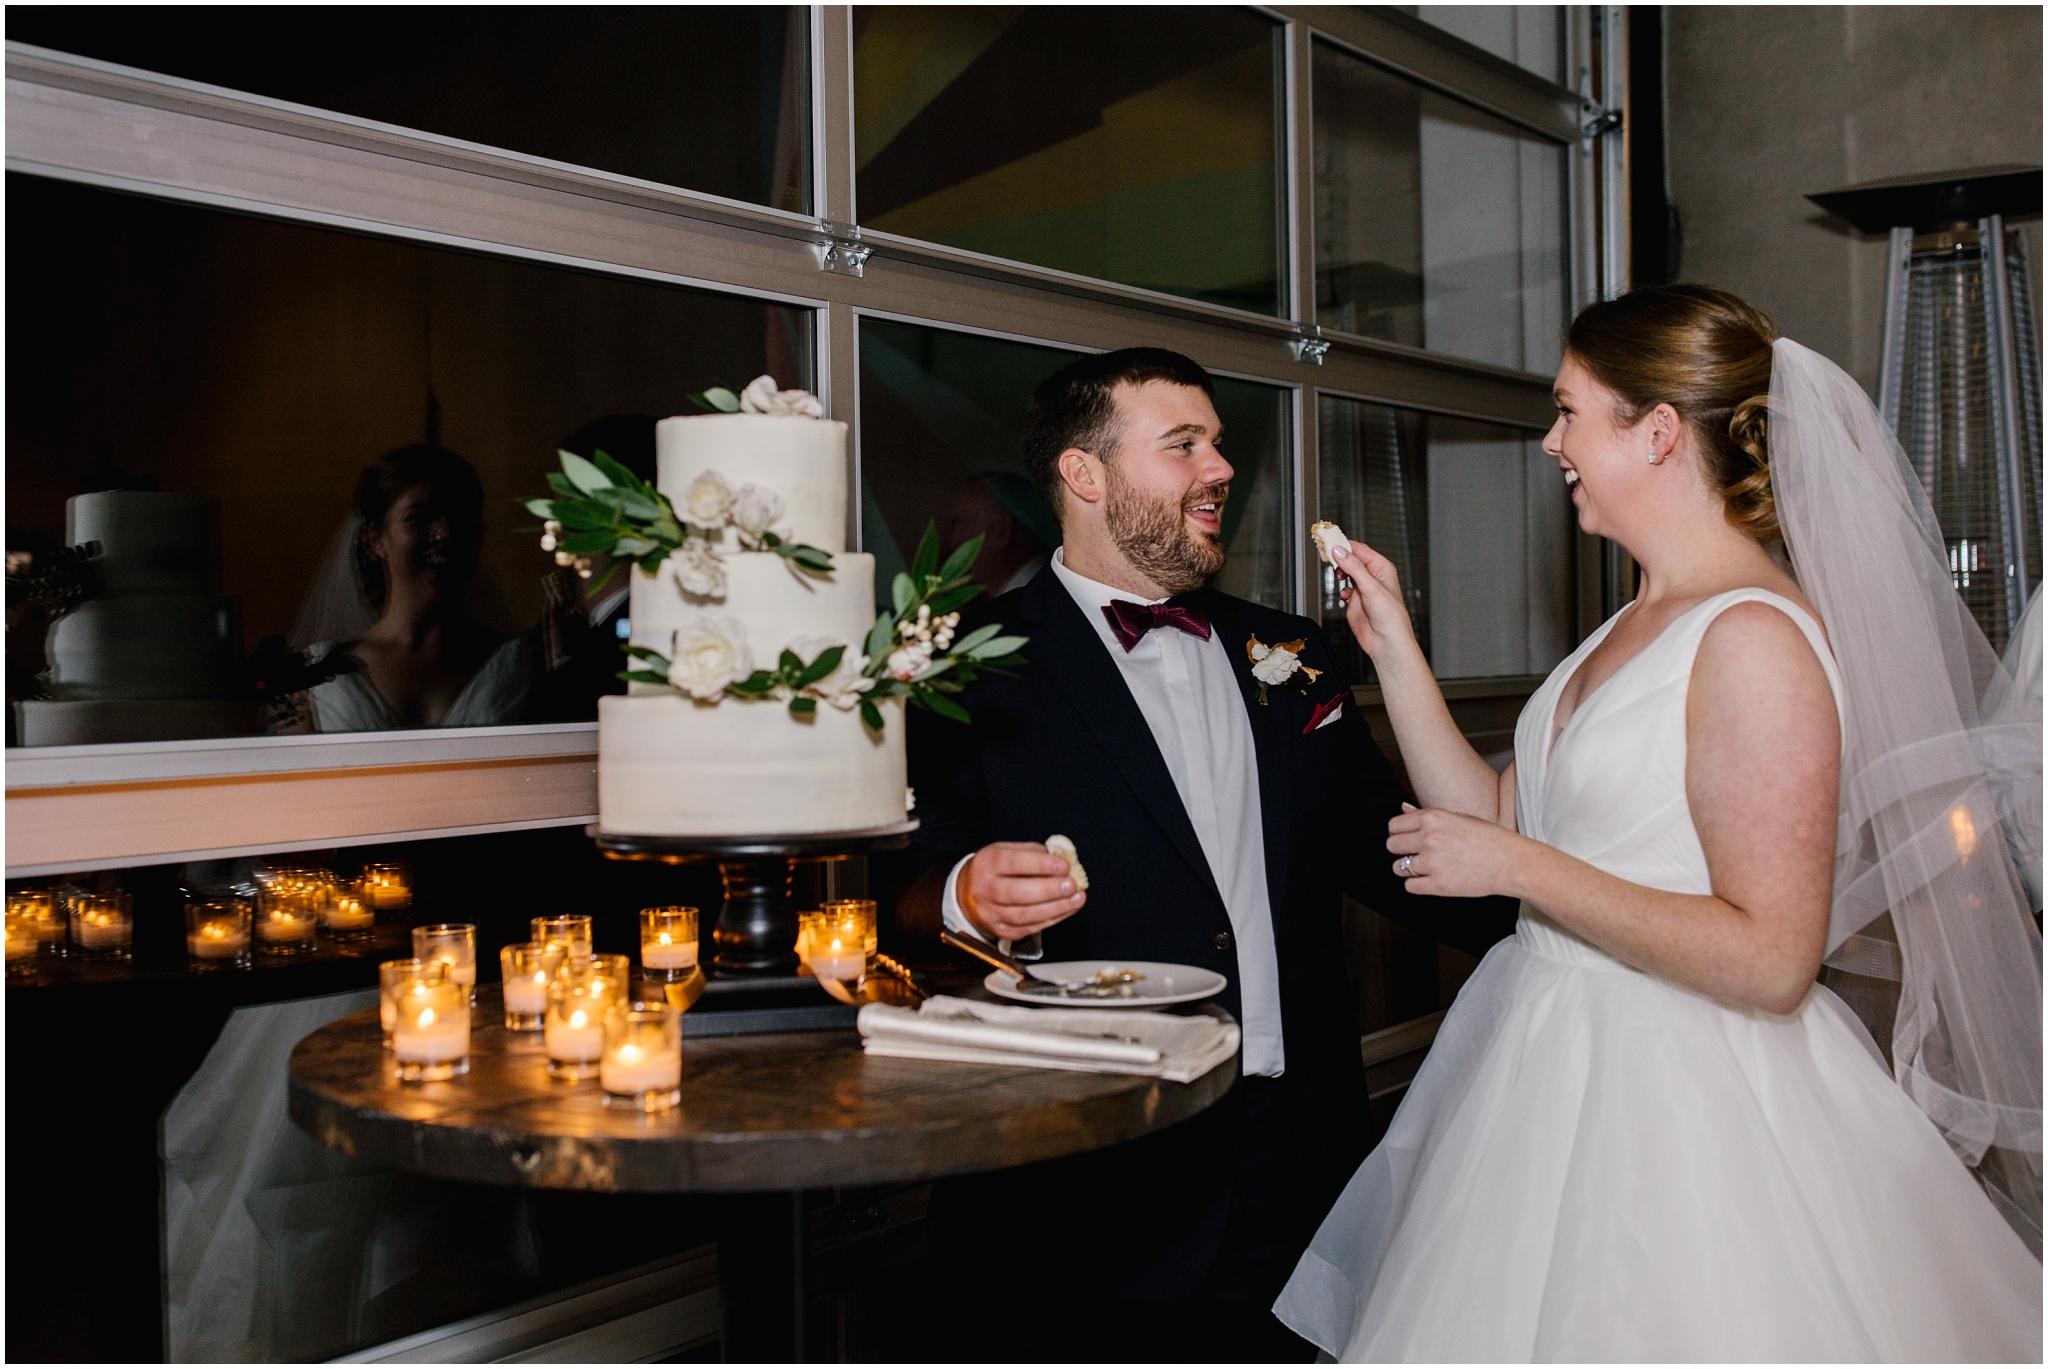 CN-Wedding-448_Lizzie-B-Imagery-Utah-Wedding-Photographer-Blessed-Sacrament-Catholic-Church-Sandy-Utah-The-Blended-Table-Salt-Lake-City.jpg